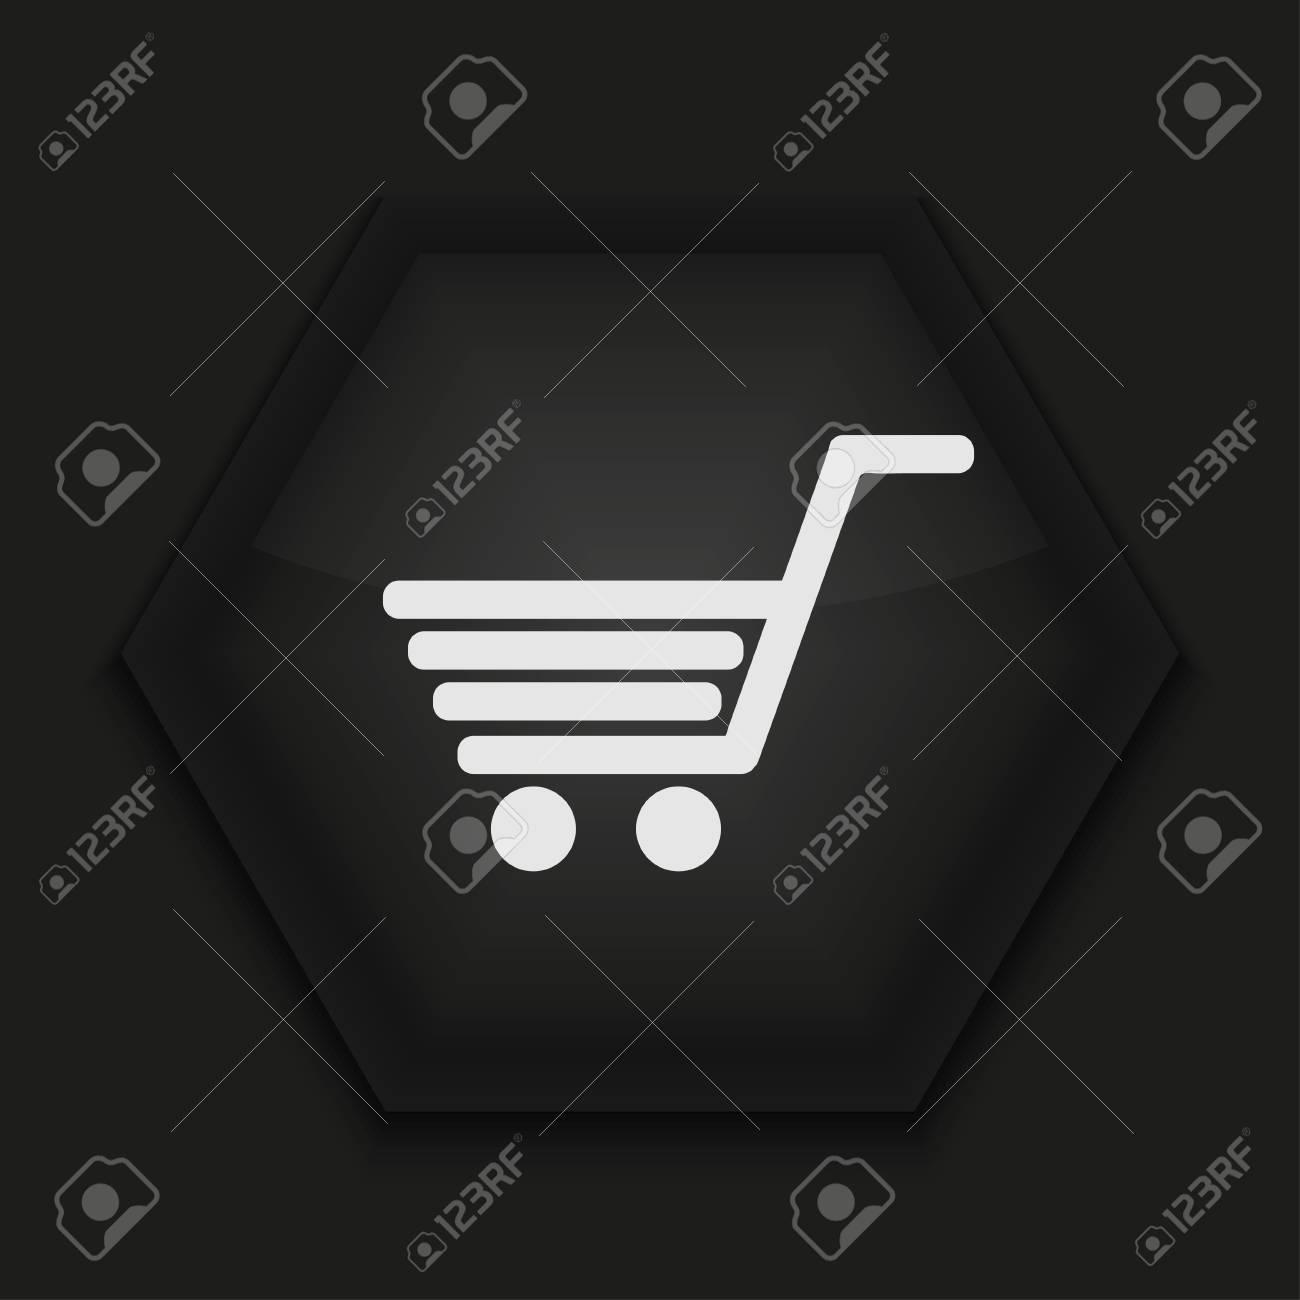 Vector creative icon on black background. Eps10 Stock Vector - 17274344